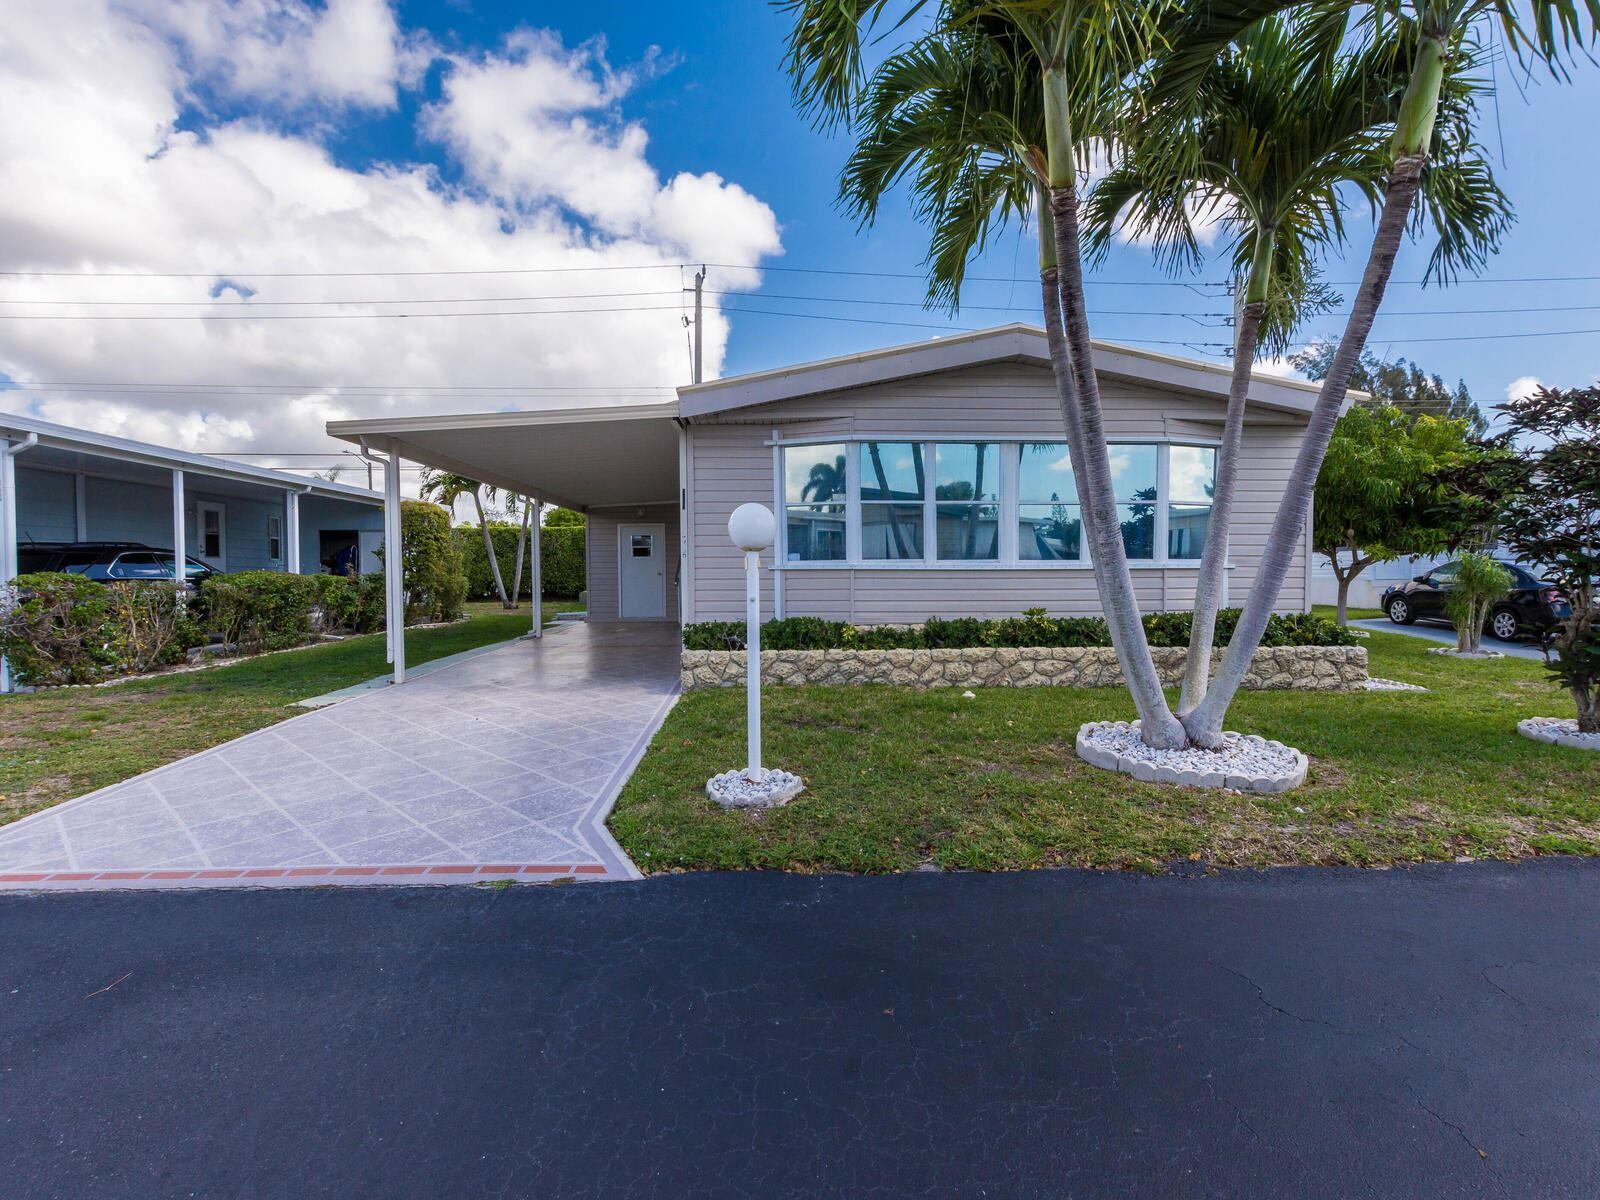 47007 Aquadilla Bay, Boynton Beach, FL 33436 - MLS#: RX-10709137